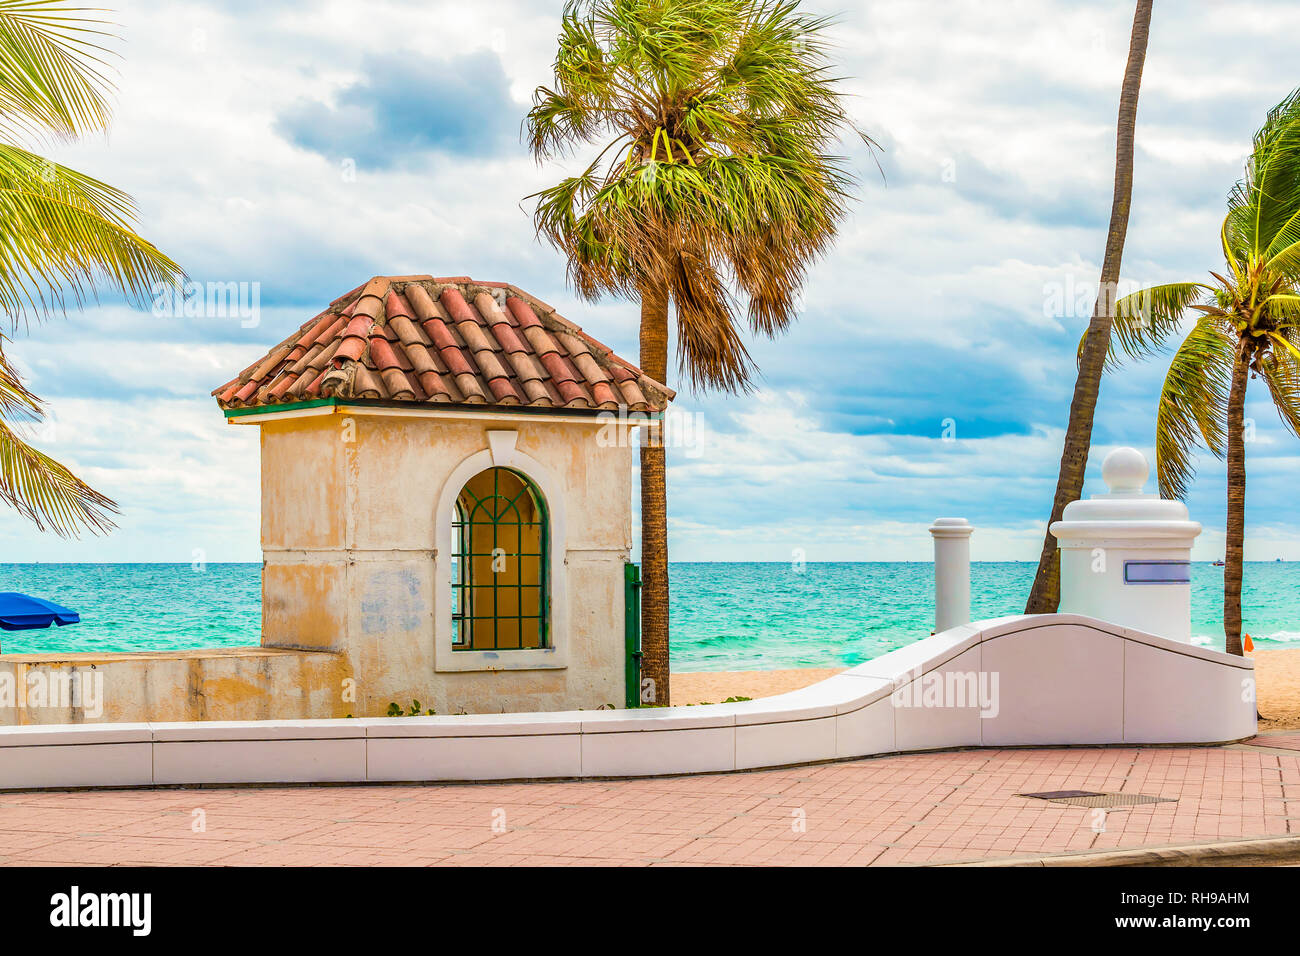 Fort Lauderdale beach, Florida Stock Photo